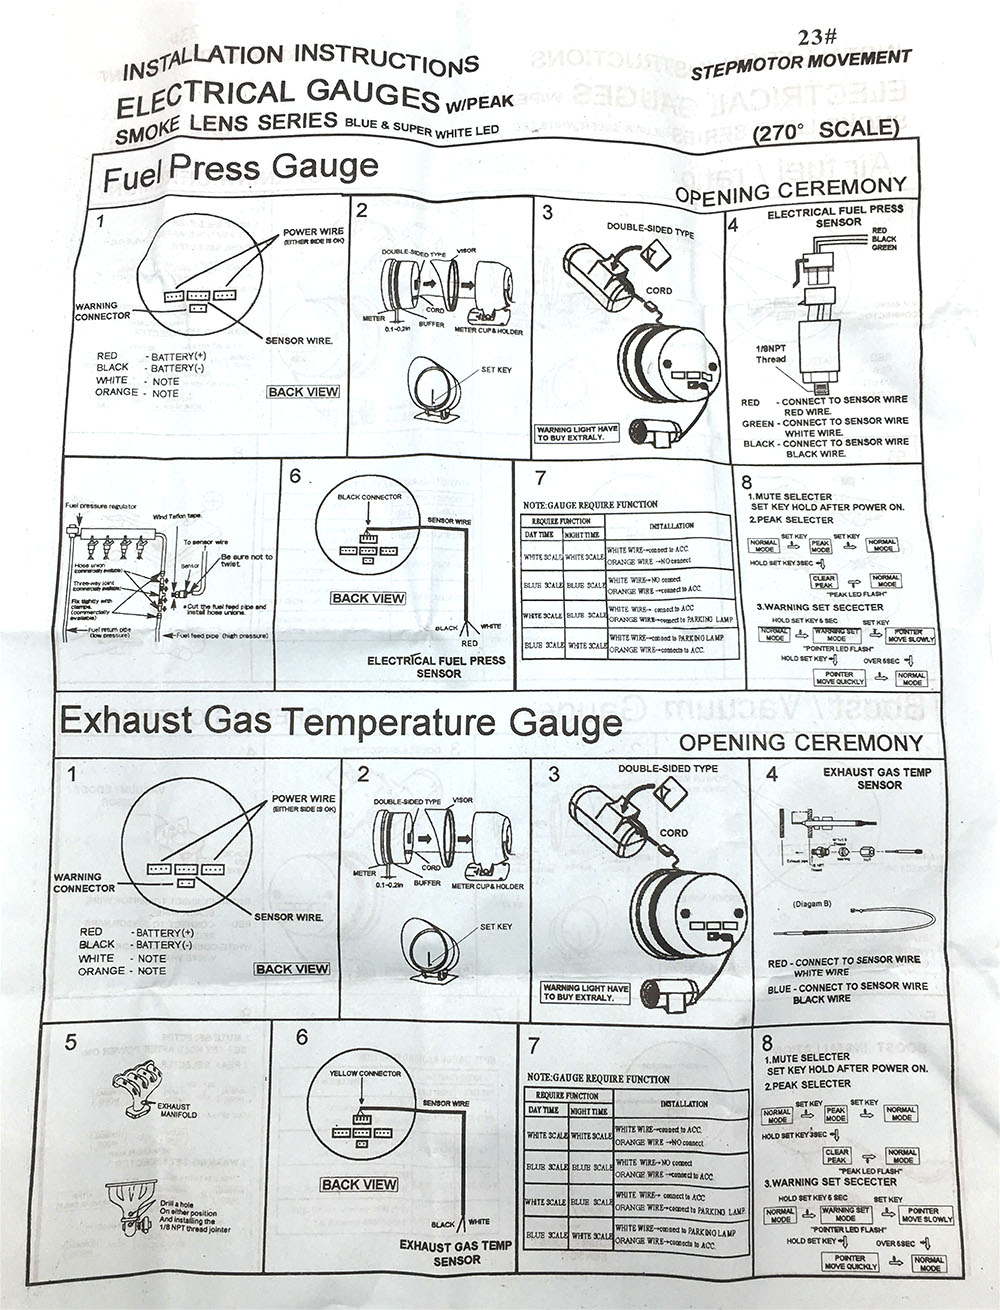 medium resolution of air fuel ratio gauge exhaust gas temperature gauge tachometer gauge boost gauge vacuum gauge oil temperature water temperature oil pressure gauge voltmeter